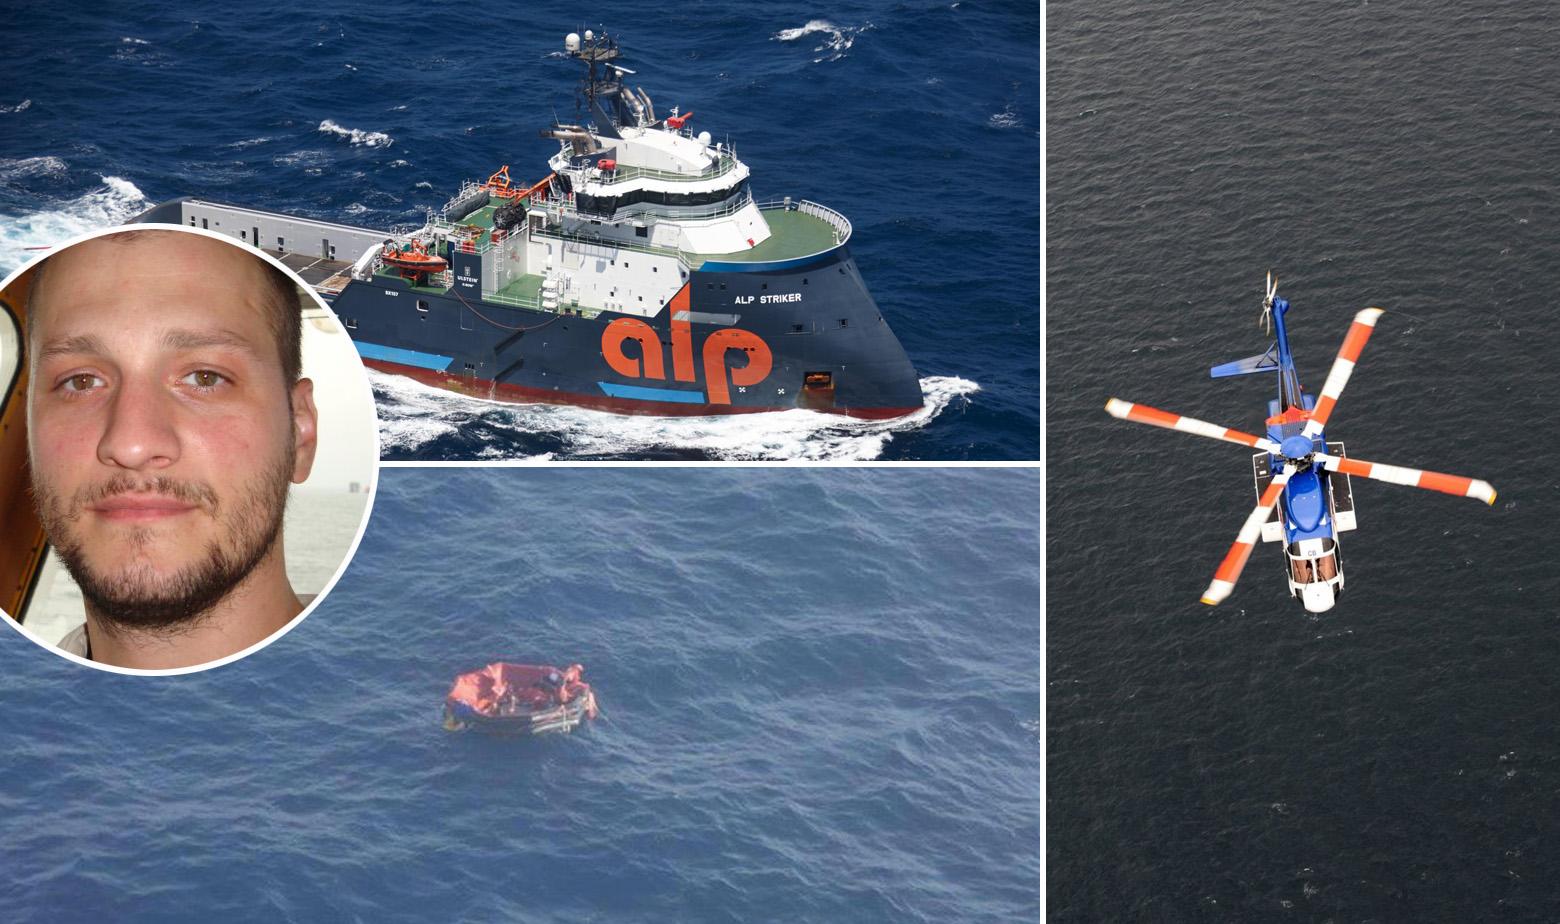 Dino Miškić, brod Alp Striker, spašeni pomorci s Bourbon Rhodea i ilustracija helikoptera Sikorsky S-92